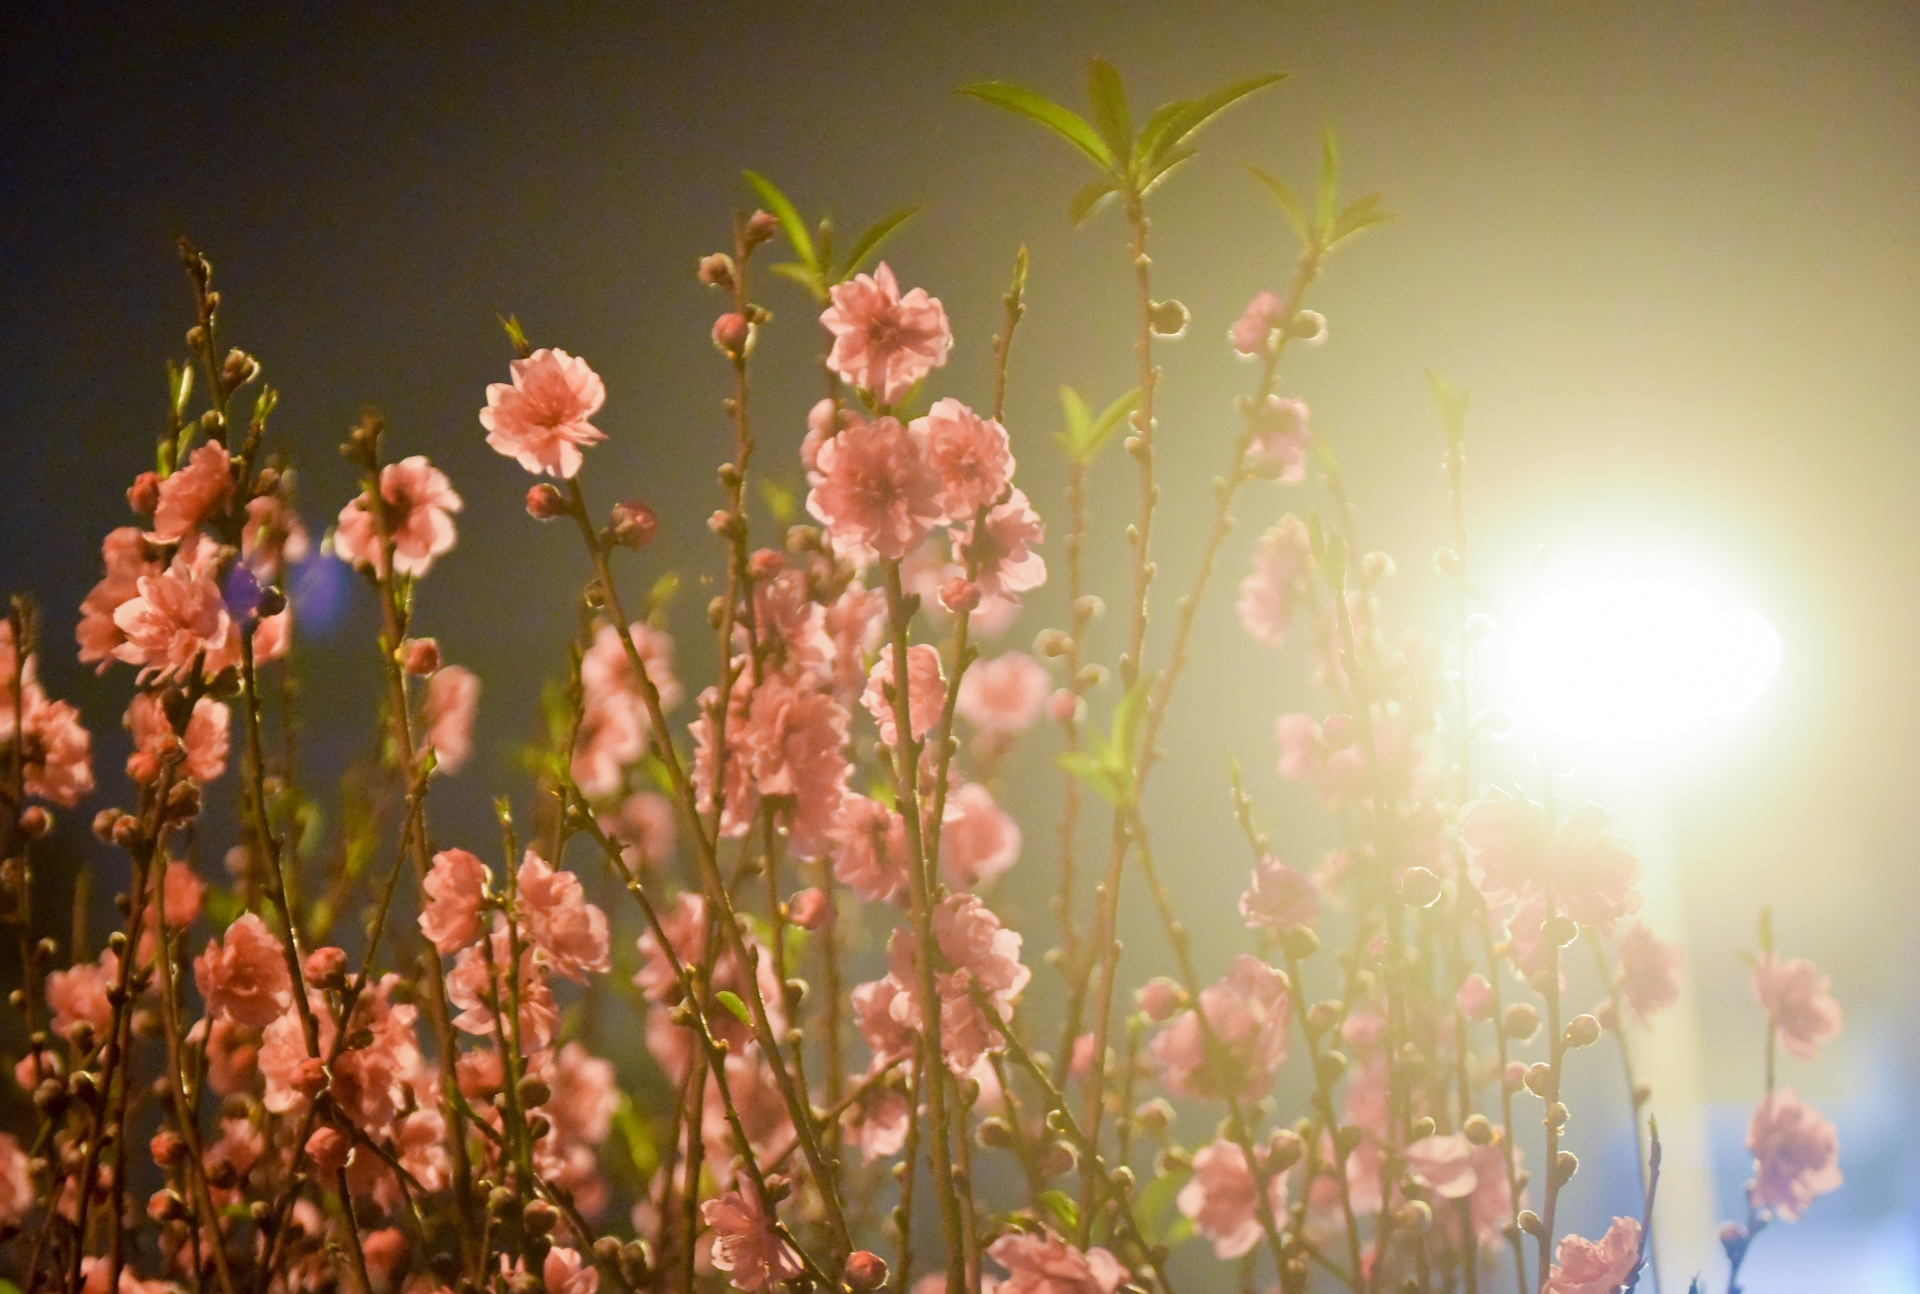 Canh an, ngu ban hoa Tet dem o Ha Noi, Sai Gon hinh anh 9